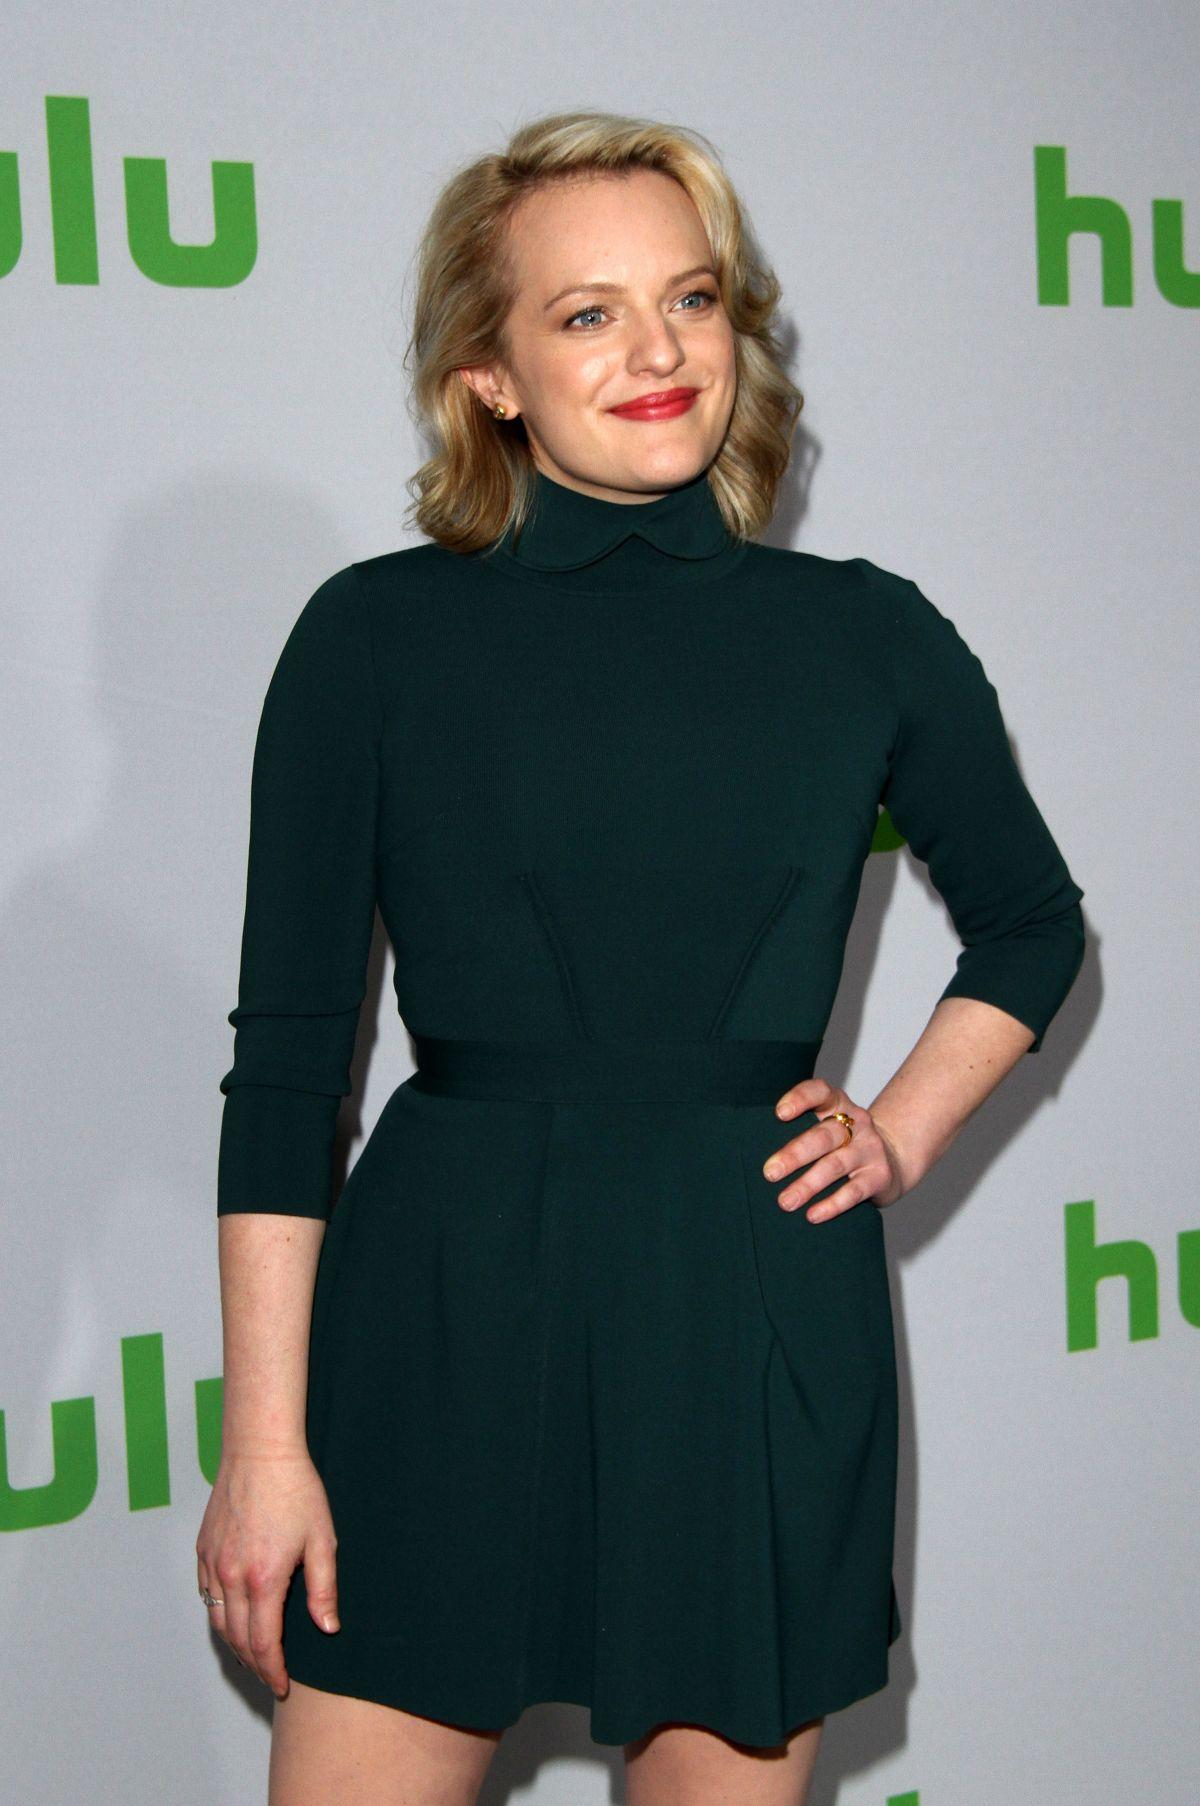 ELISABETH MOSS at Hulu's Winter TCA 2017 in Los Angeles 01/07/2017